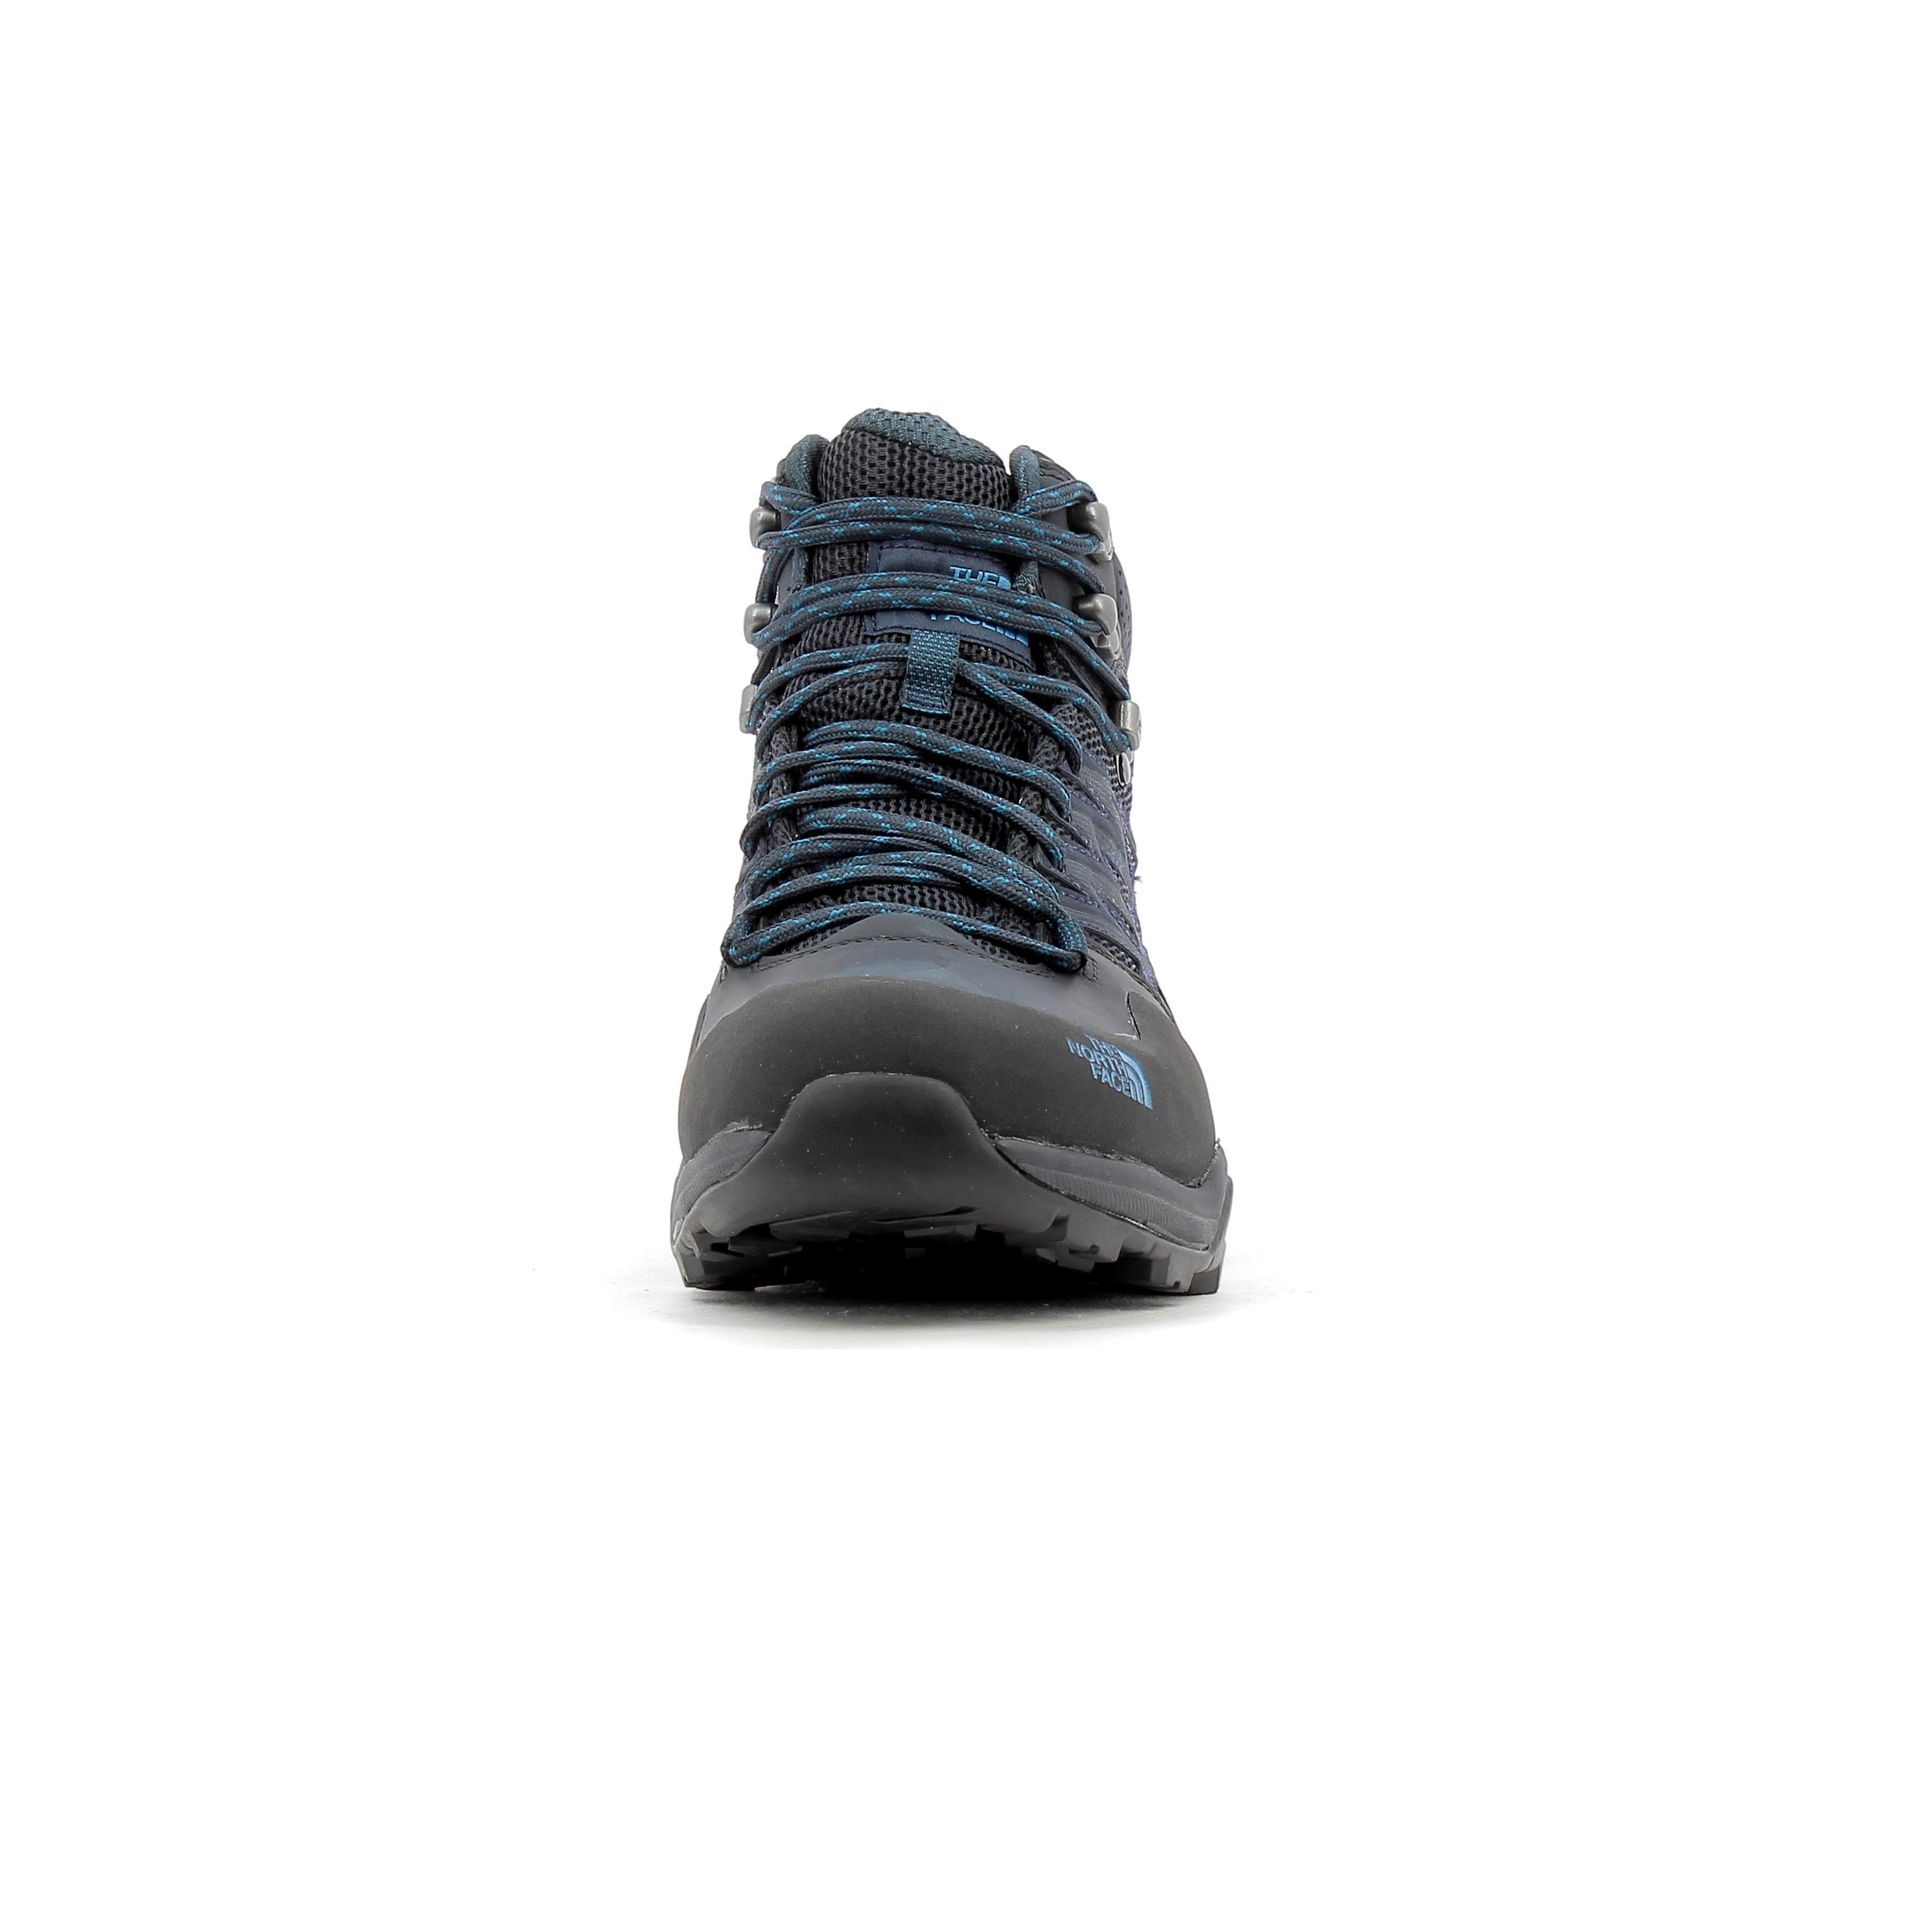 Face Hedgehog Mid Gtx Chaussures The Randonnée Hike De North IfqvC